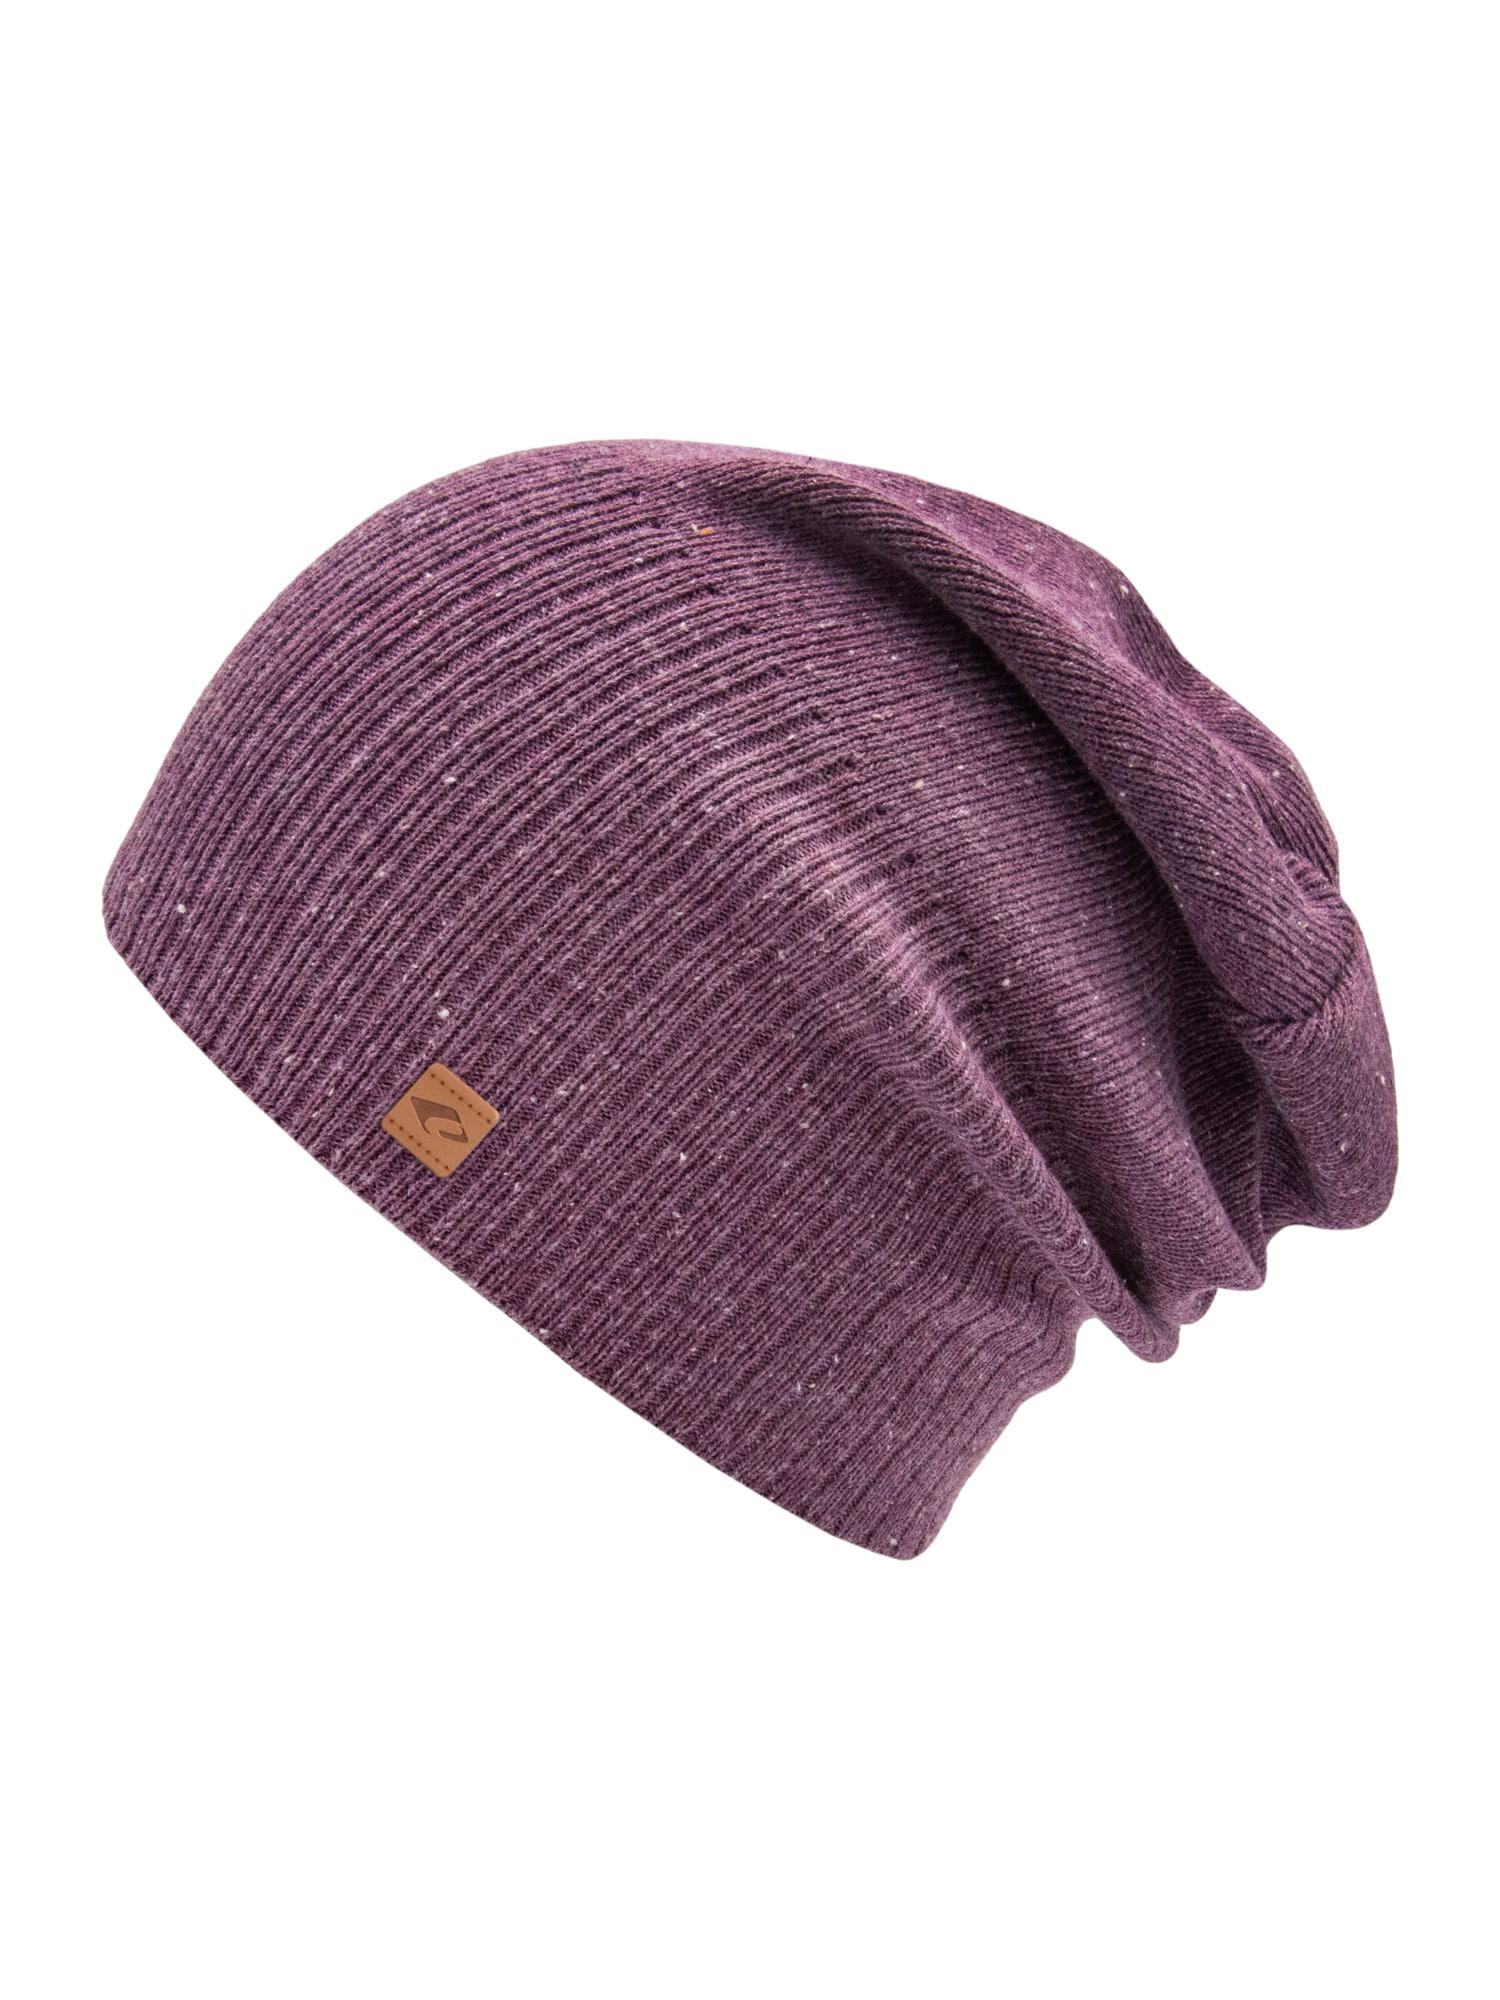 chillouts Megzta kepurė 'Lowell' uogų spalva